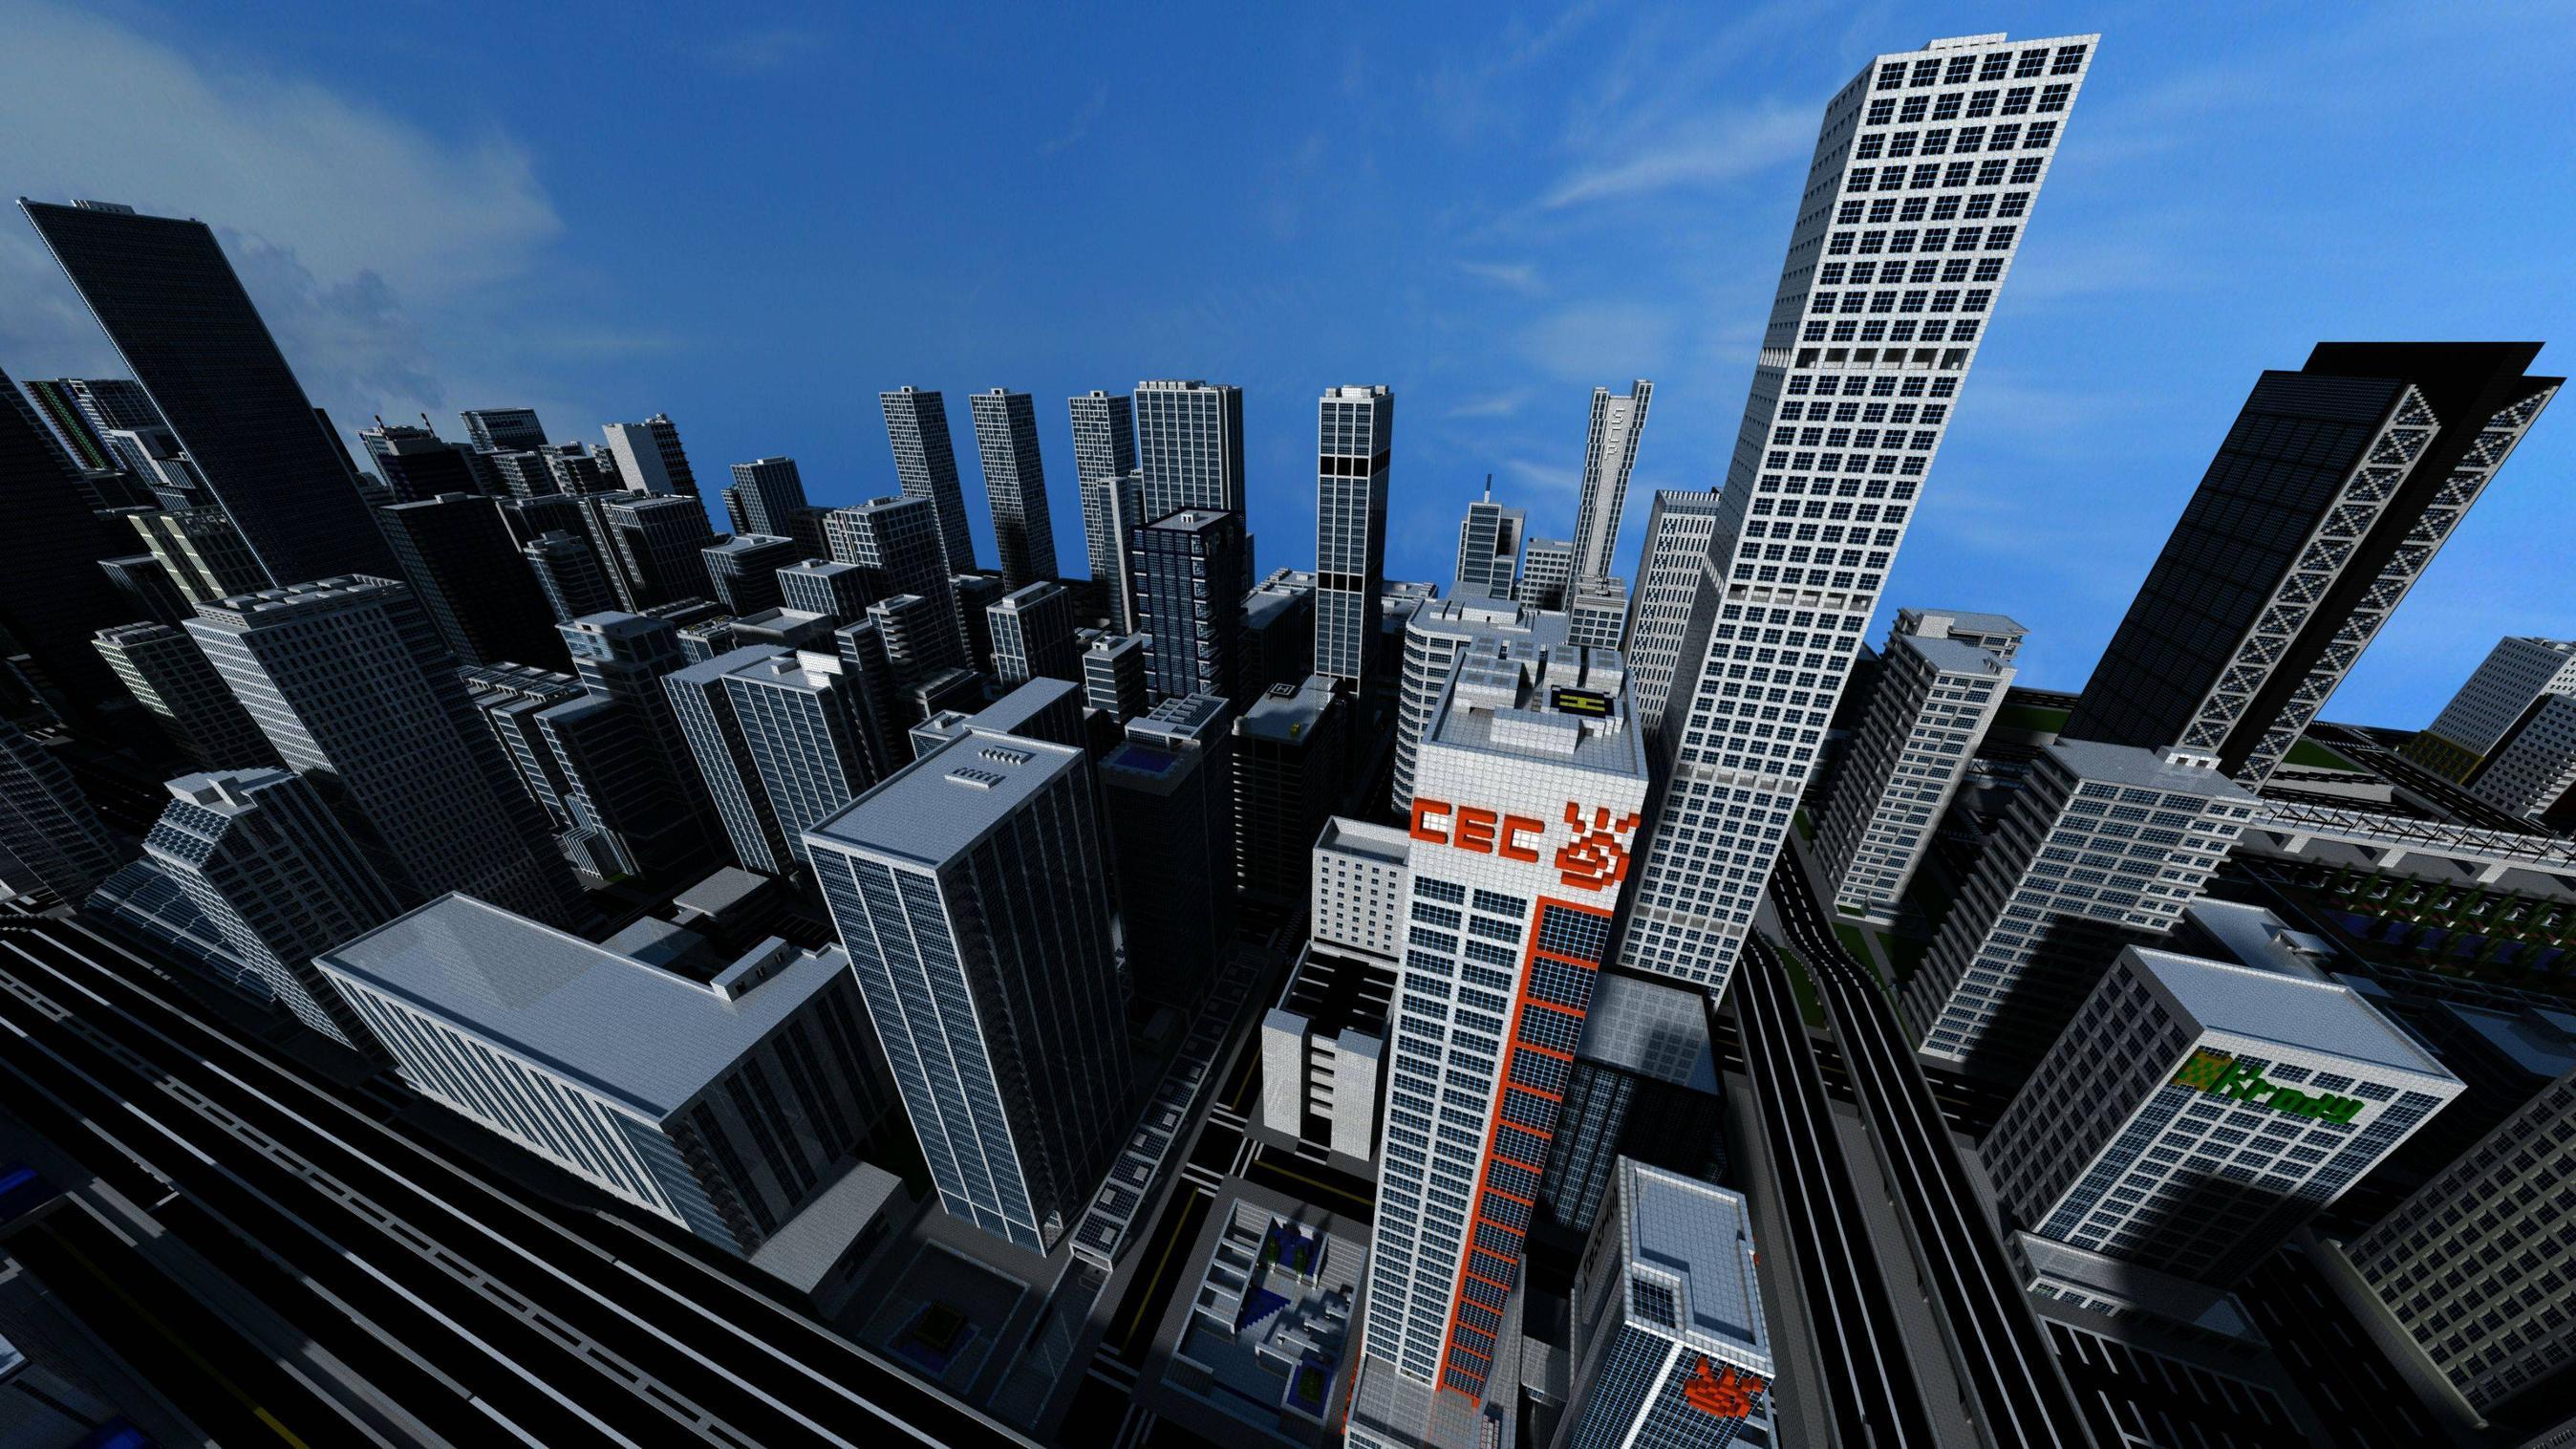 Minecraft City Wallpapers - Top Free Minecraft City